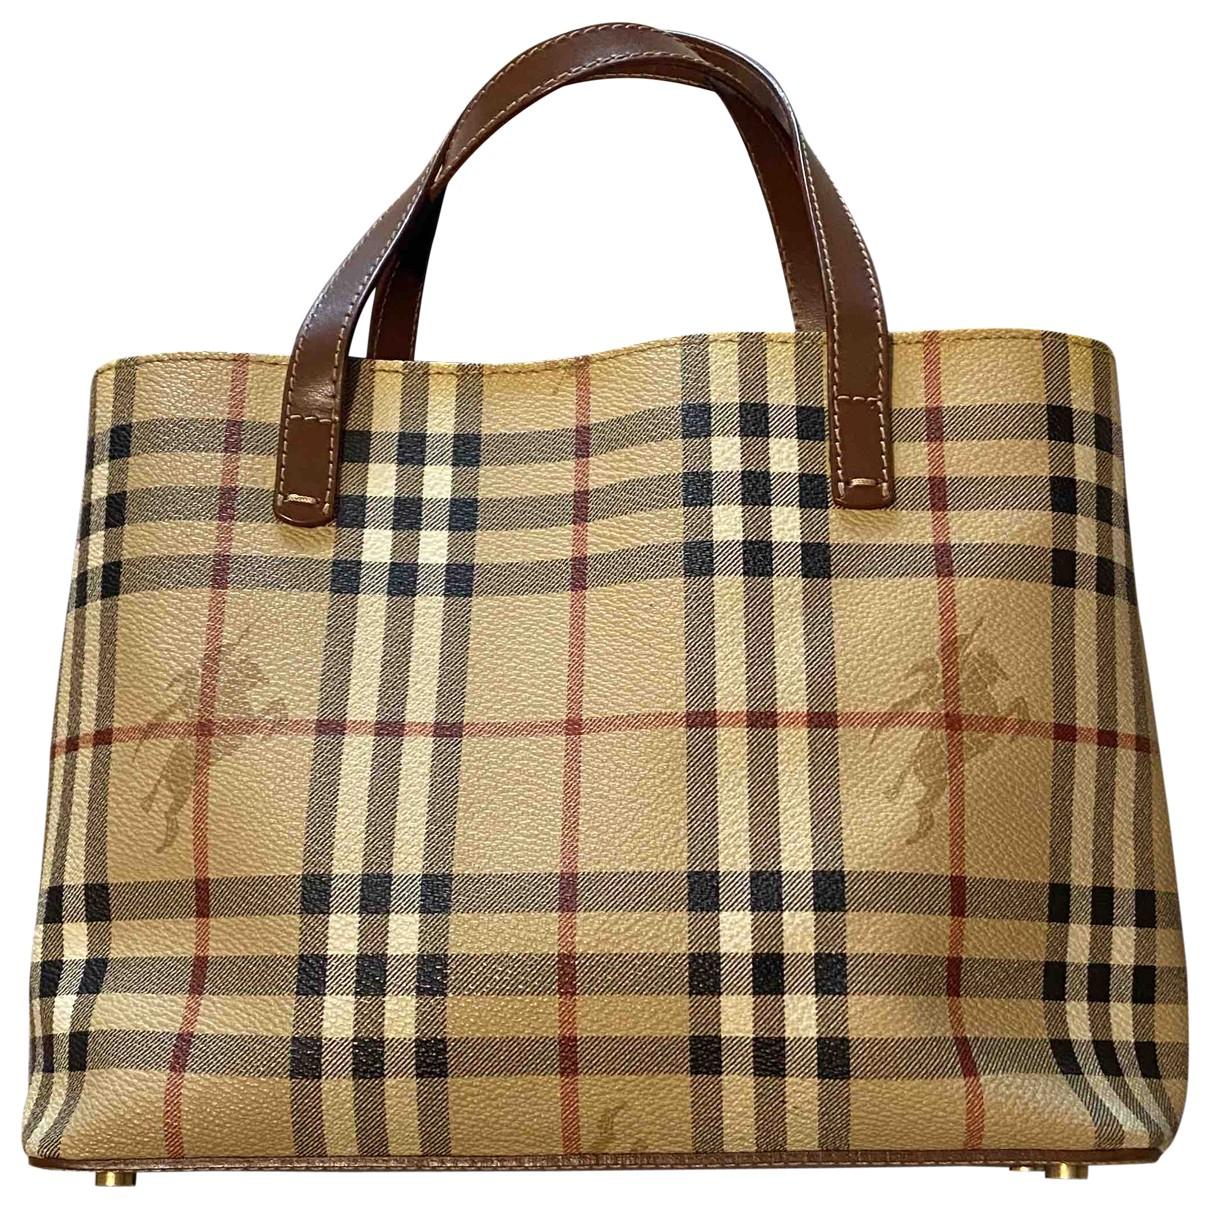 Burberry \N Beige Cloth handbag for Women \N